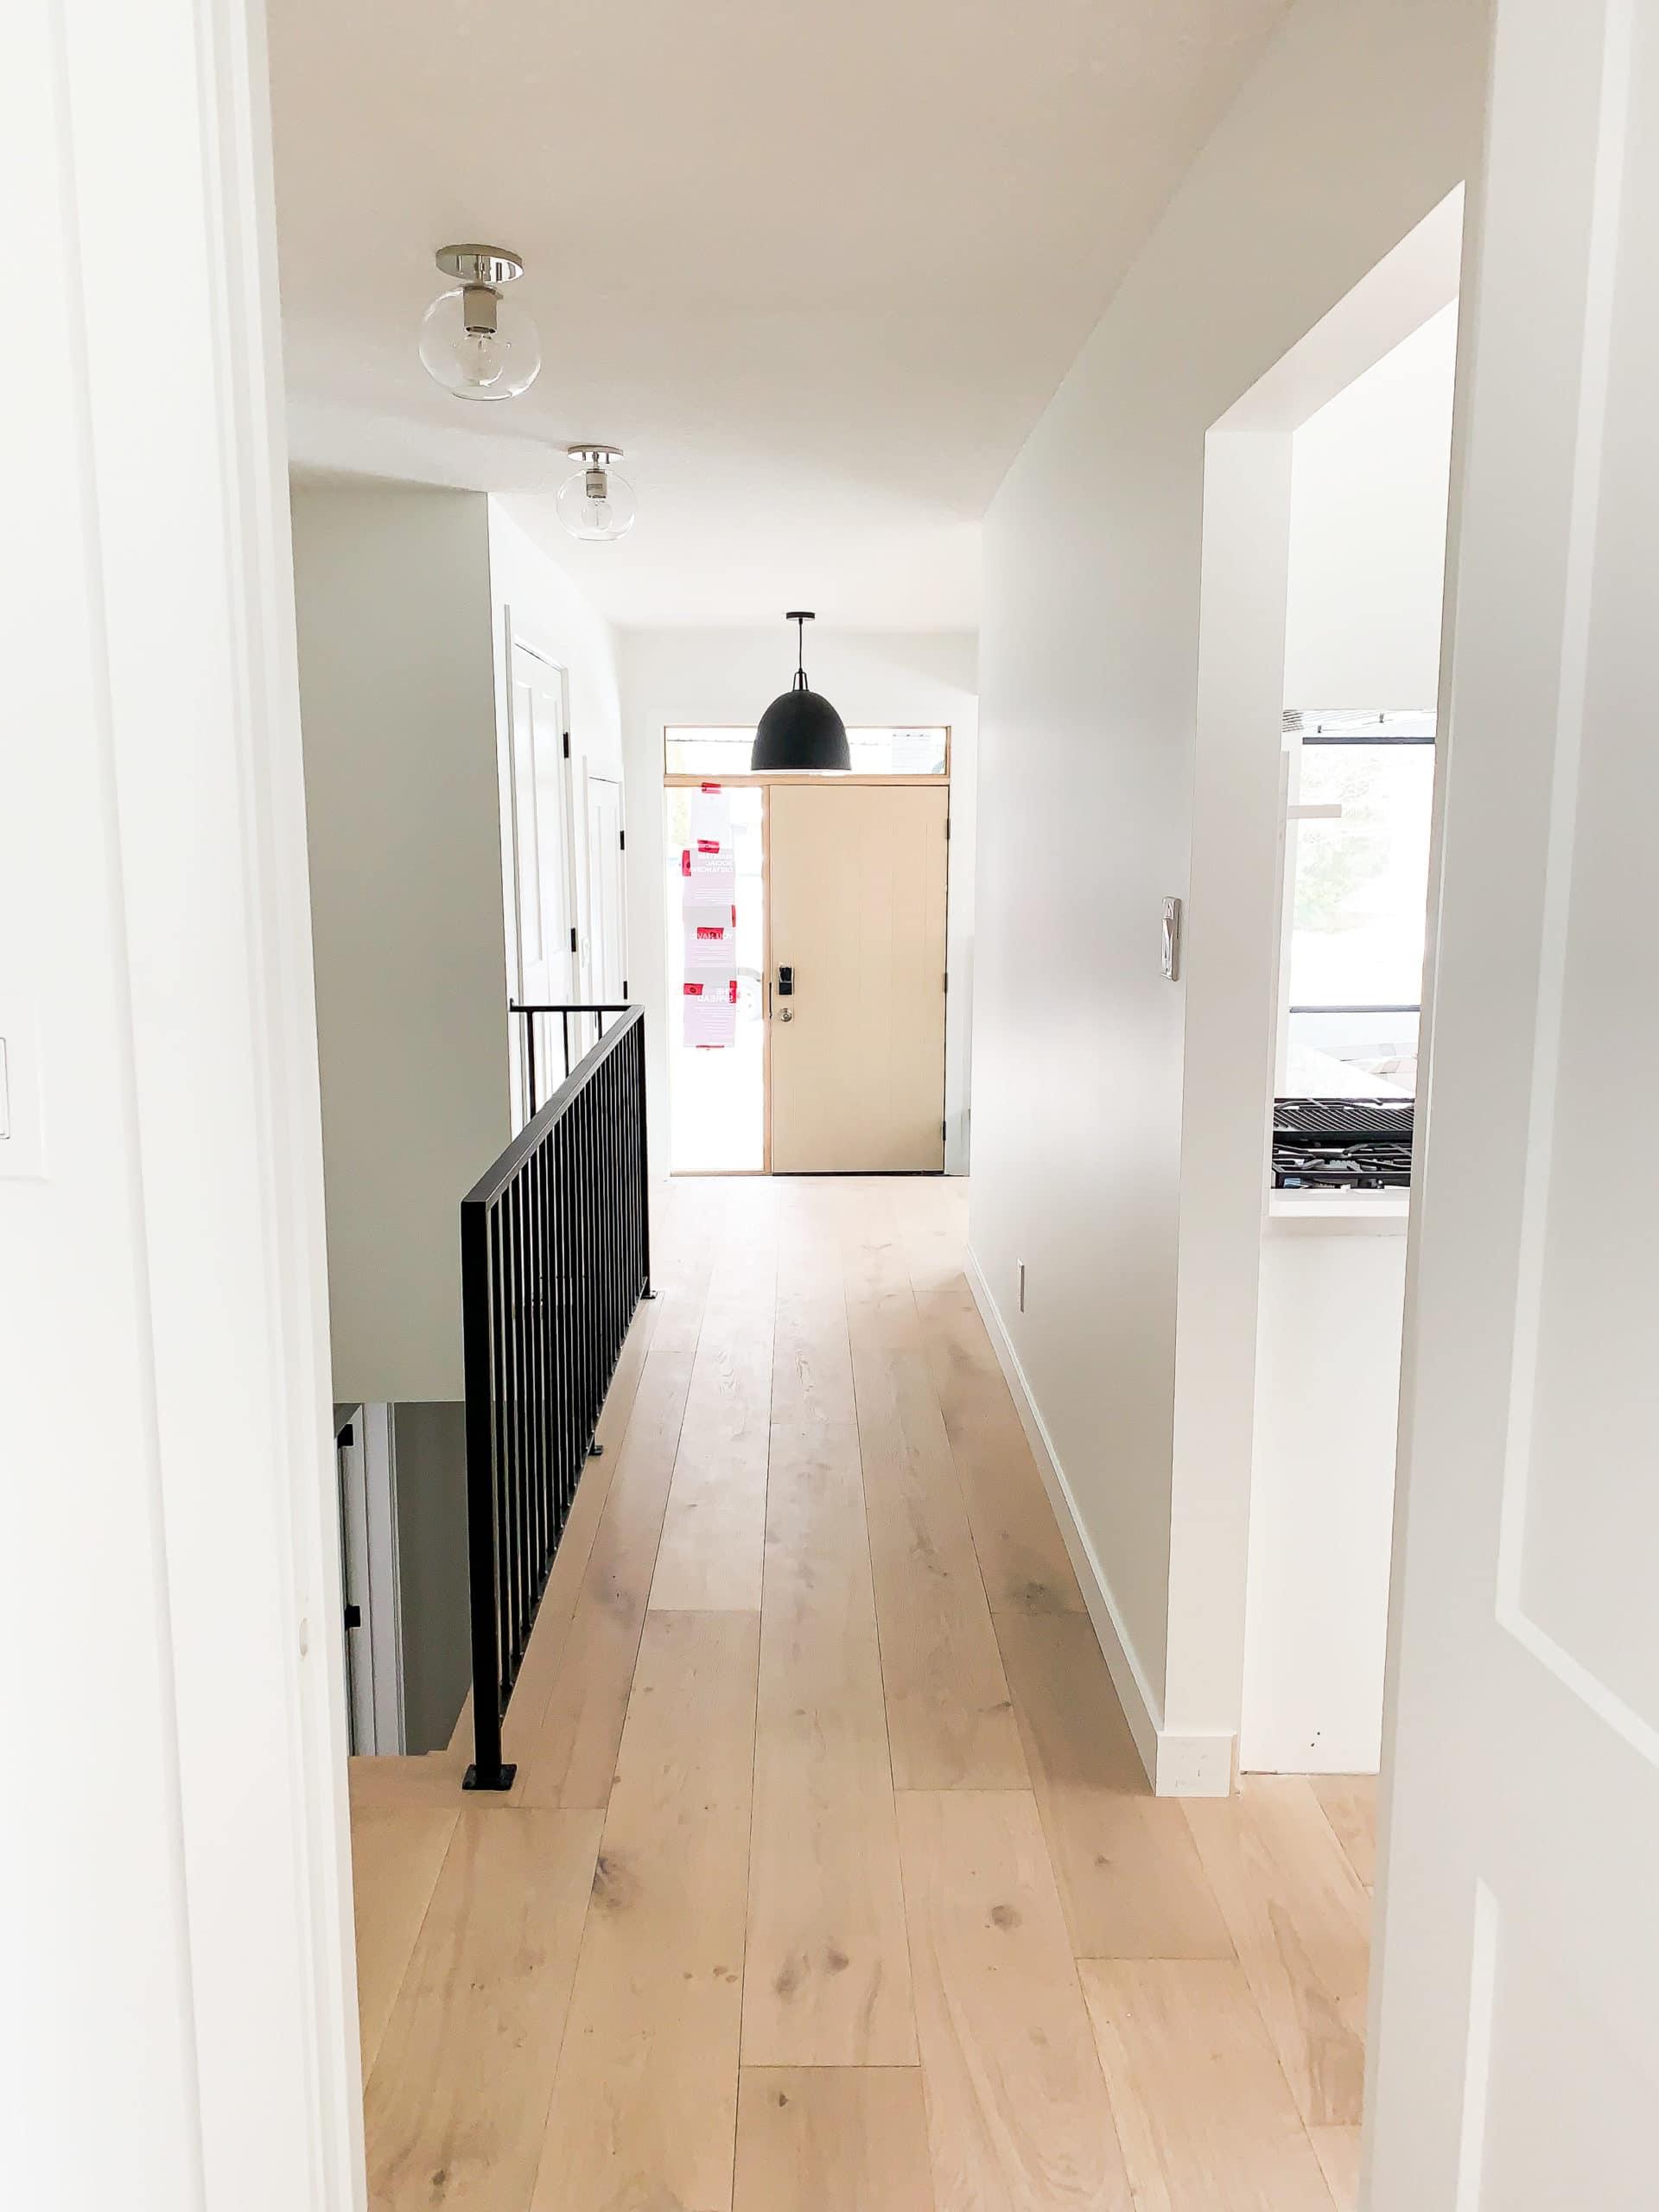 Full Home Renovation - Earthy Coastal Scandinavian California Minimal Entry Remodel